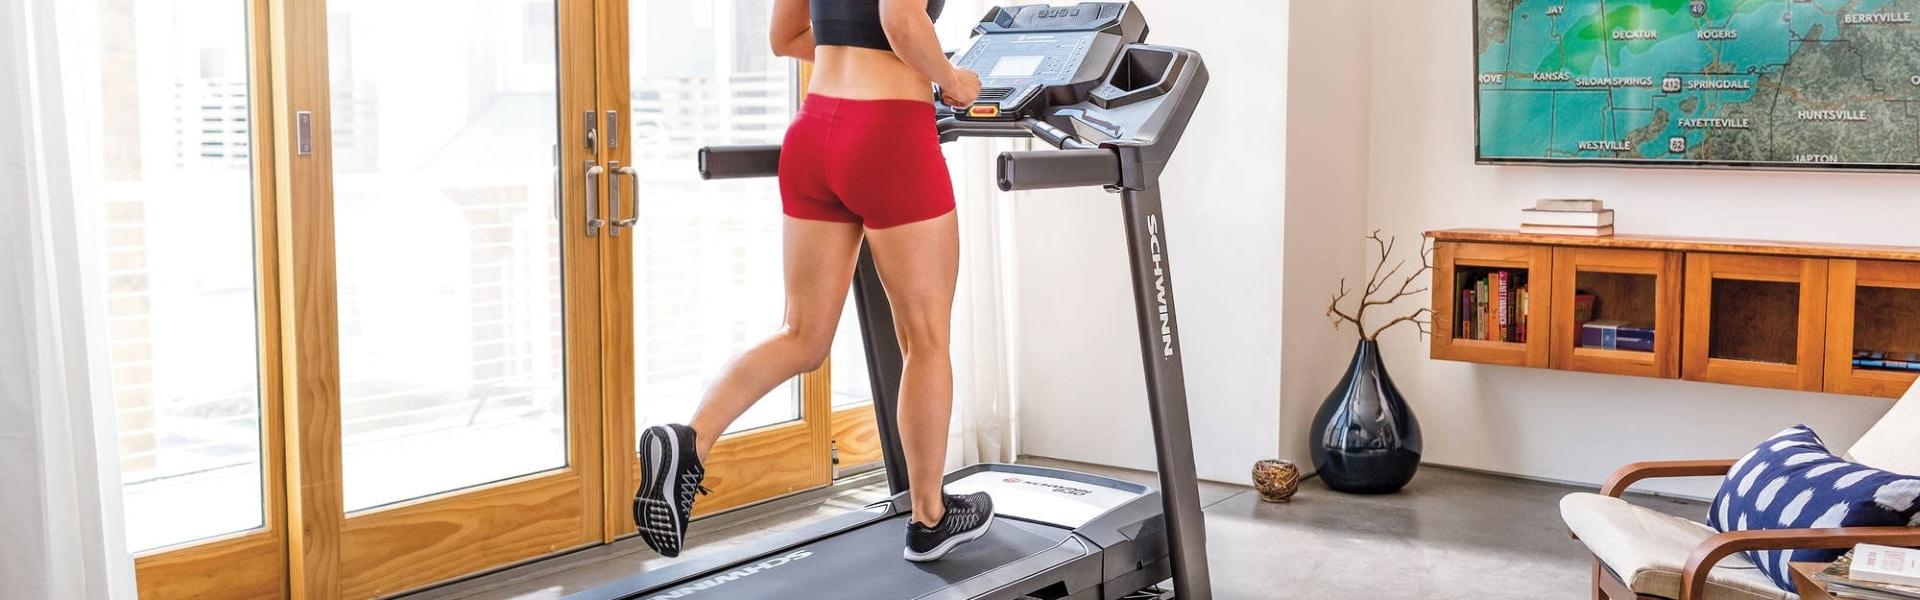 6 Best Treadmills Under 1000 Jul 2020 Reviews Buying Guide